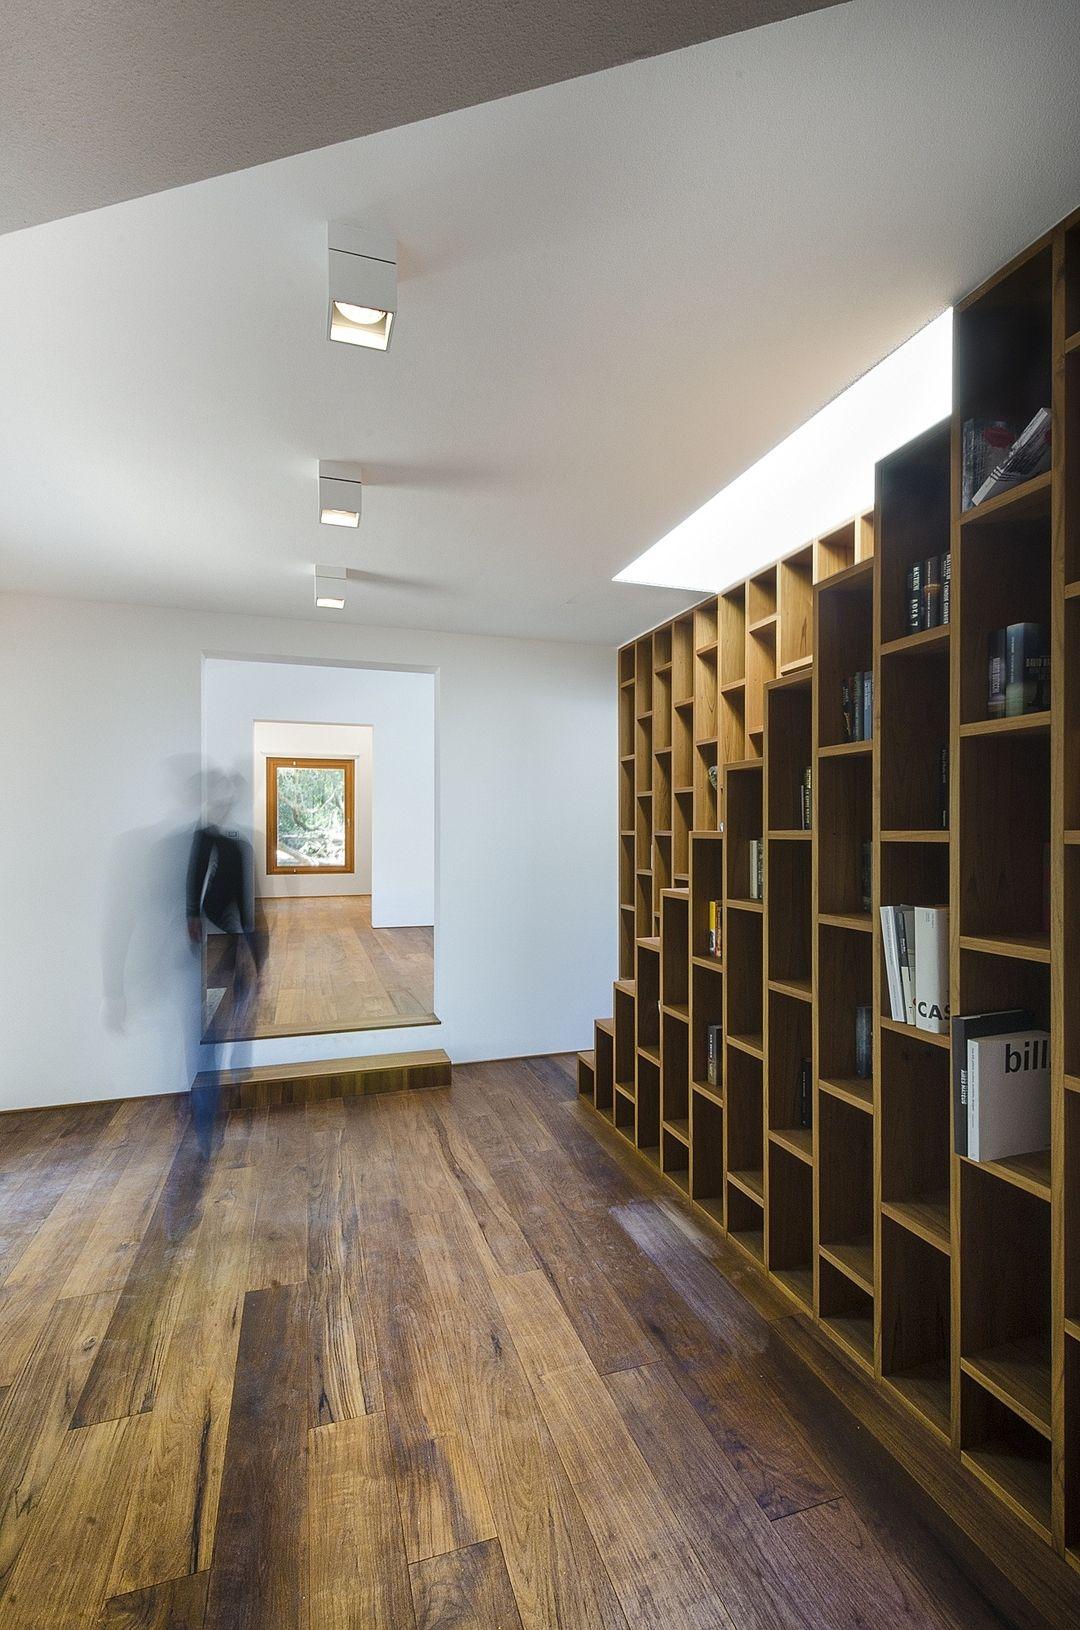 Interior design minimalism design details monumental minimalism in house on a pinewood architizer